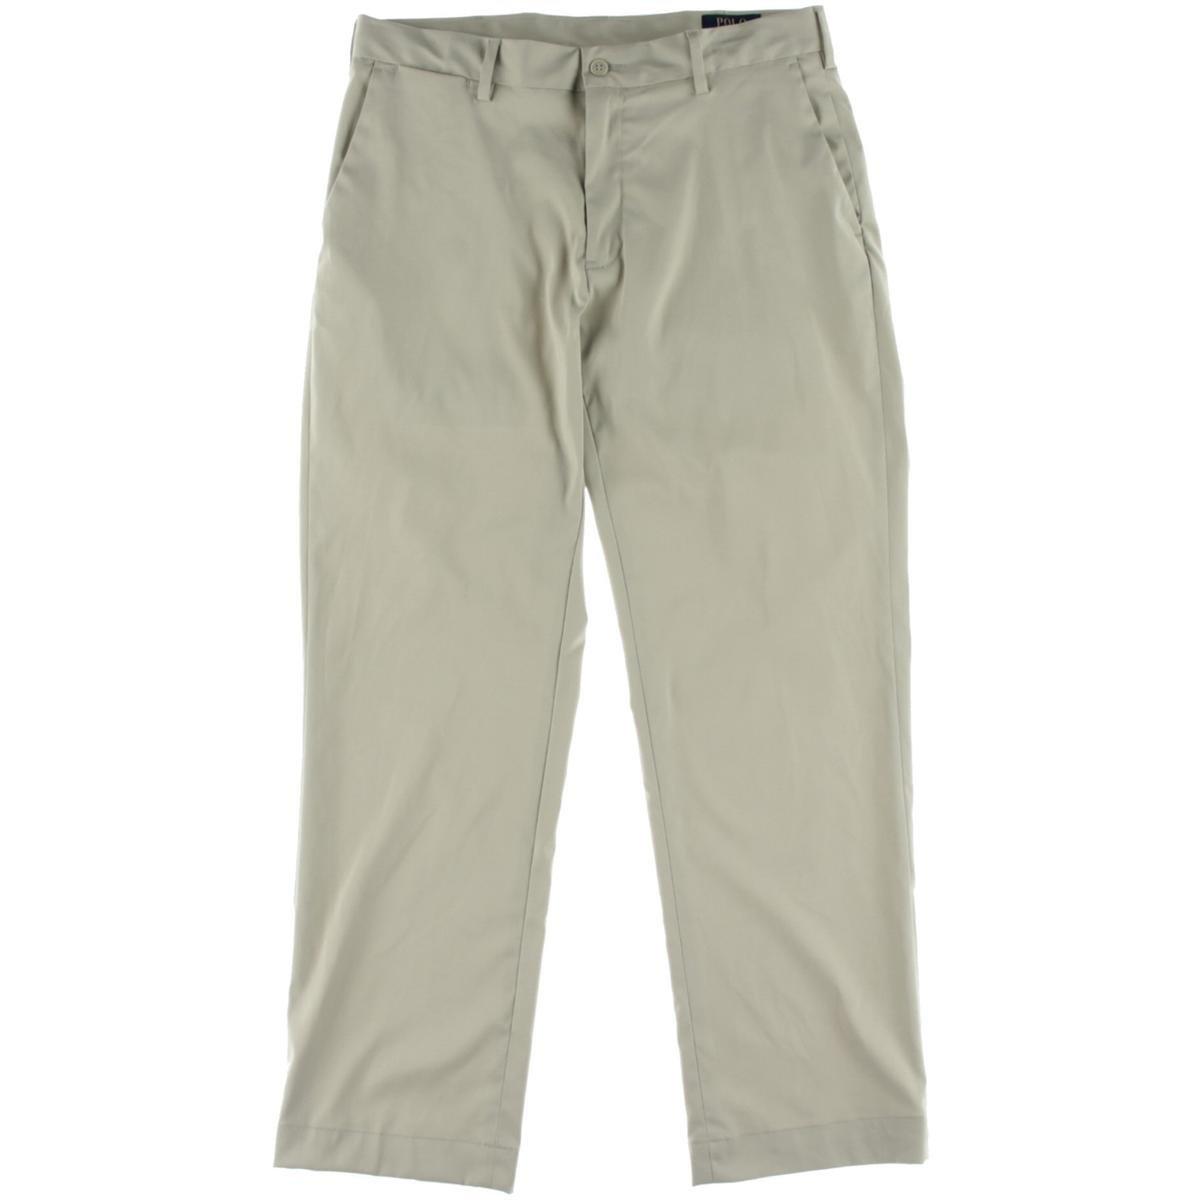 Polo Ralph Lauren Mens Classic Fit Performance Bootcut Pants Beige 34/30